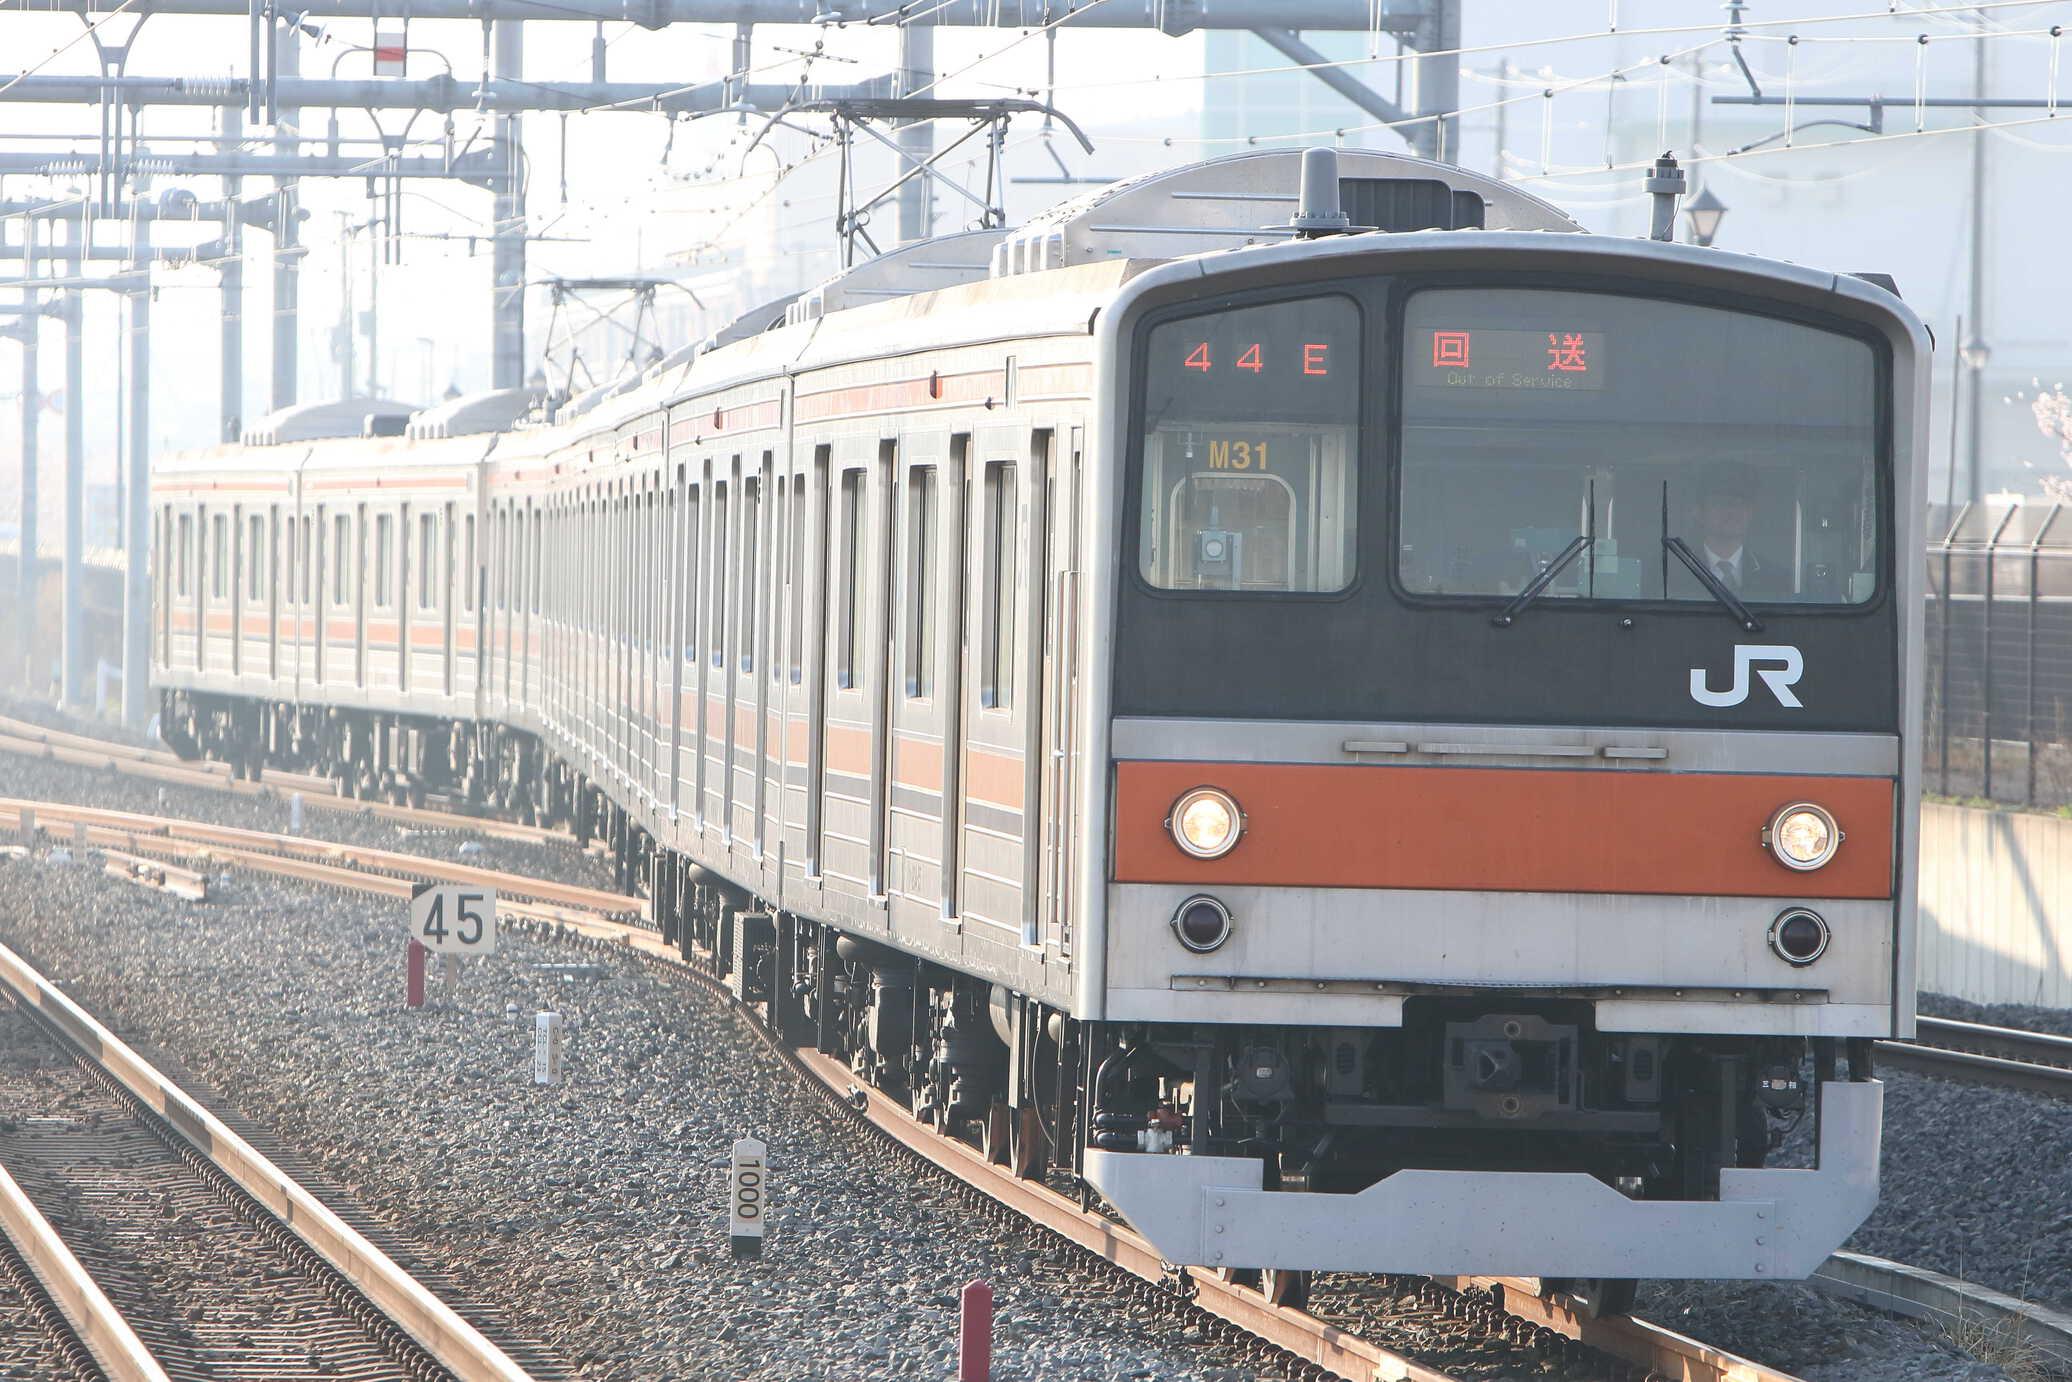 回644E〜745E 205系 千ケヨM31編成